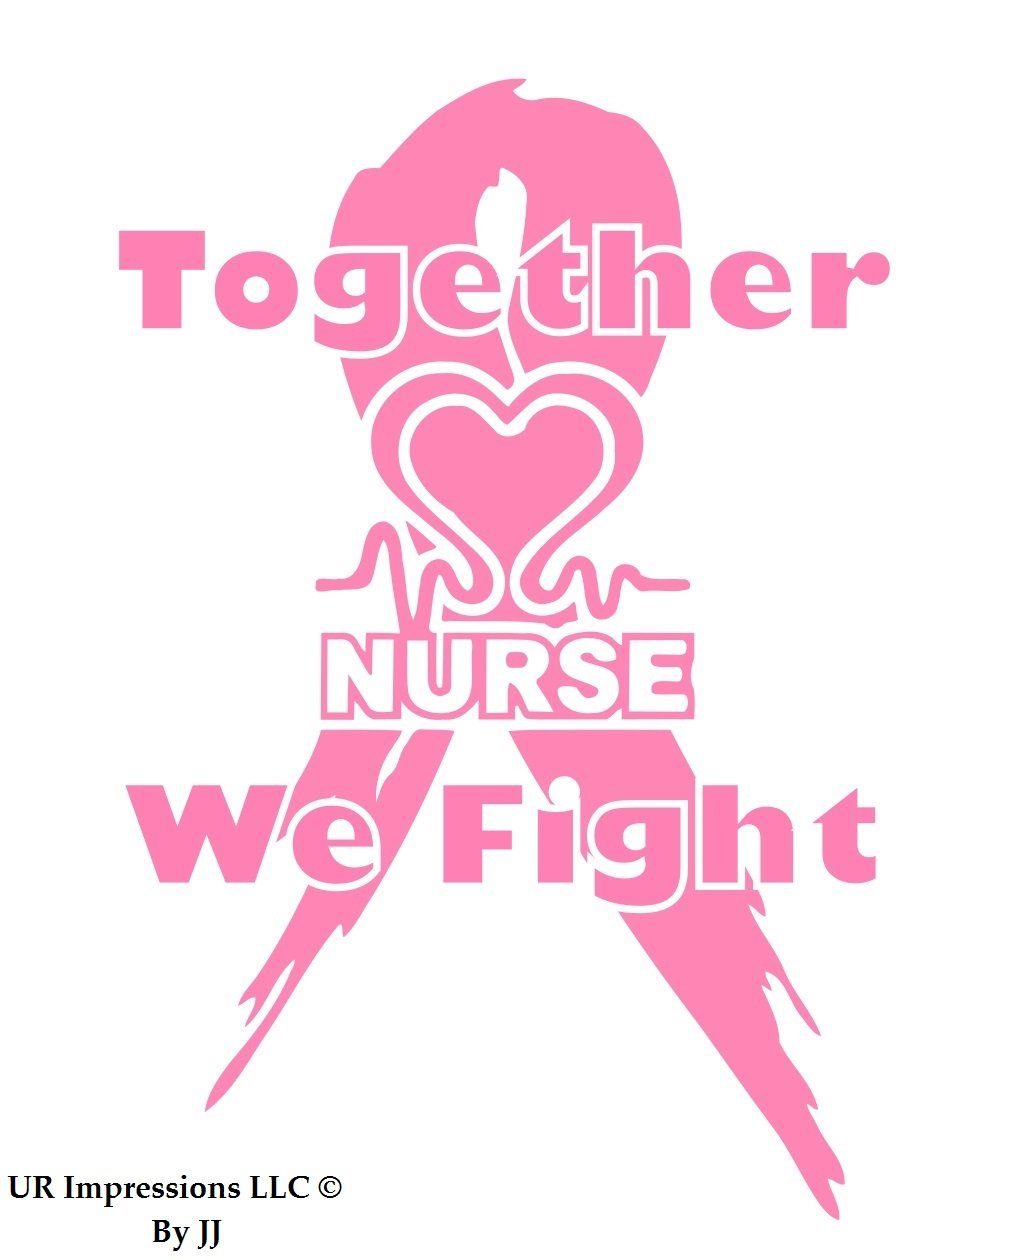 Pnk B076K4MV1V Nurse Lifeline – Together We Fight Fight Breast Cancer – Awarenessリボンデカールビニールsticker|cars Trucks壁ノートパソコンtablet|pink|6.5 X 5.5 in|jjuri026 B076K4MV1V, シートレール専門ユニプロ:9f34dbb0 --- harrow-unison.org.uk